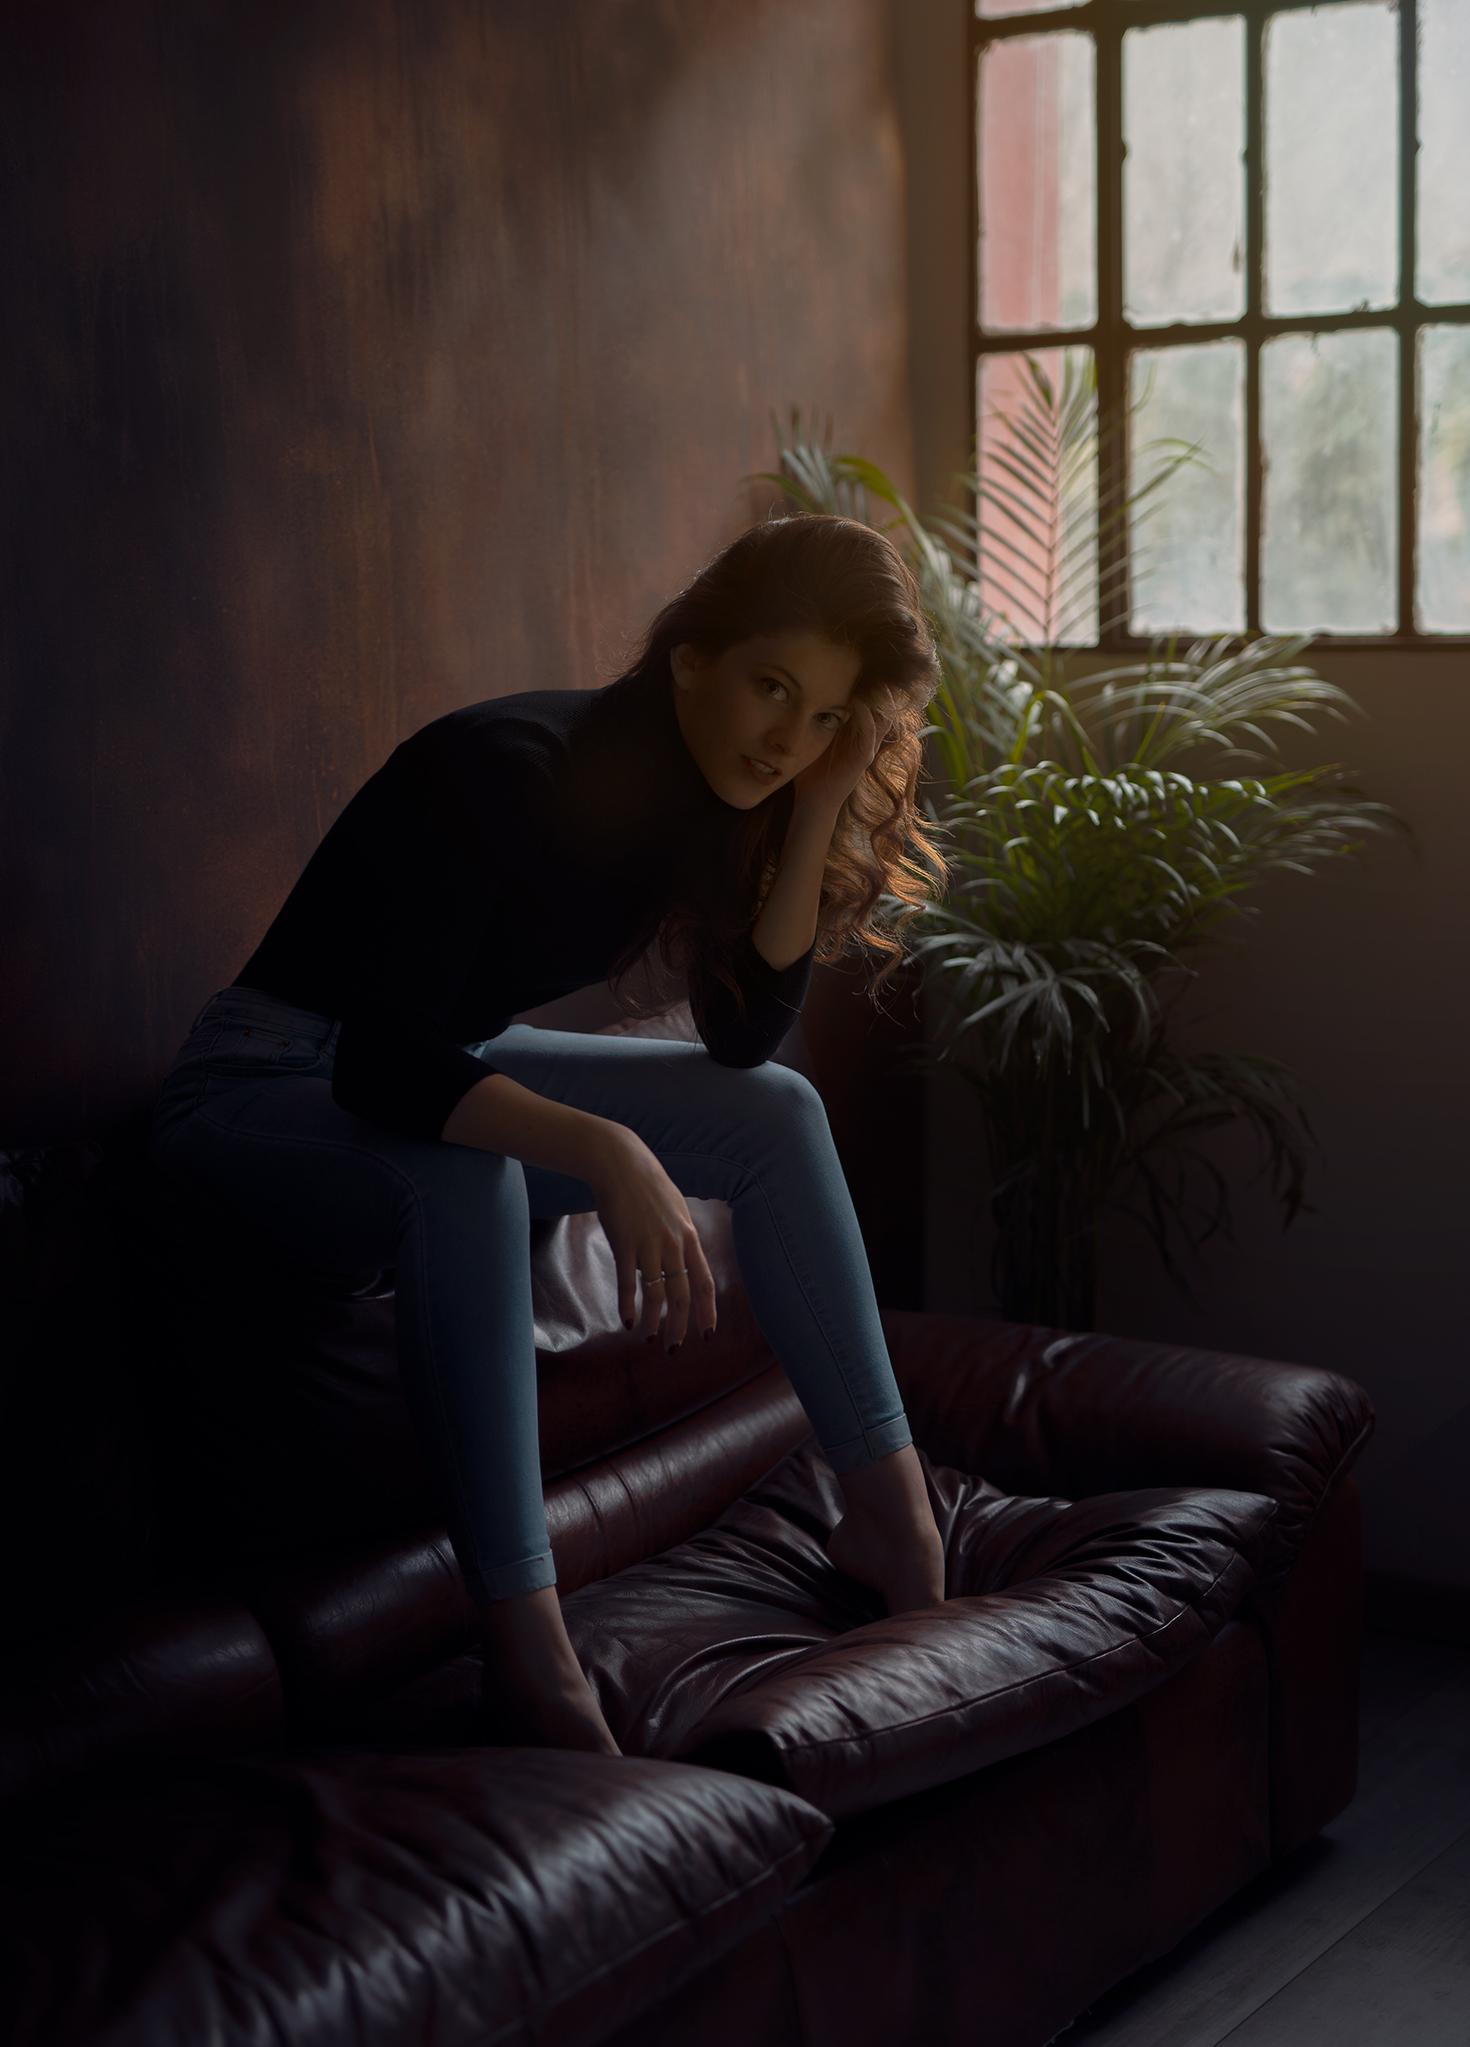 Categorie: Glamour, Portrait - Photographer: FEDERICO PASQUALINI - Model: ERIKA PRIMO - Location: Verona, VR, Italia